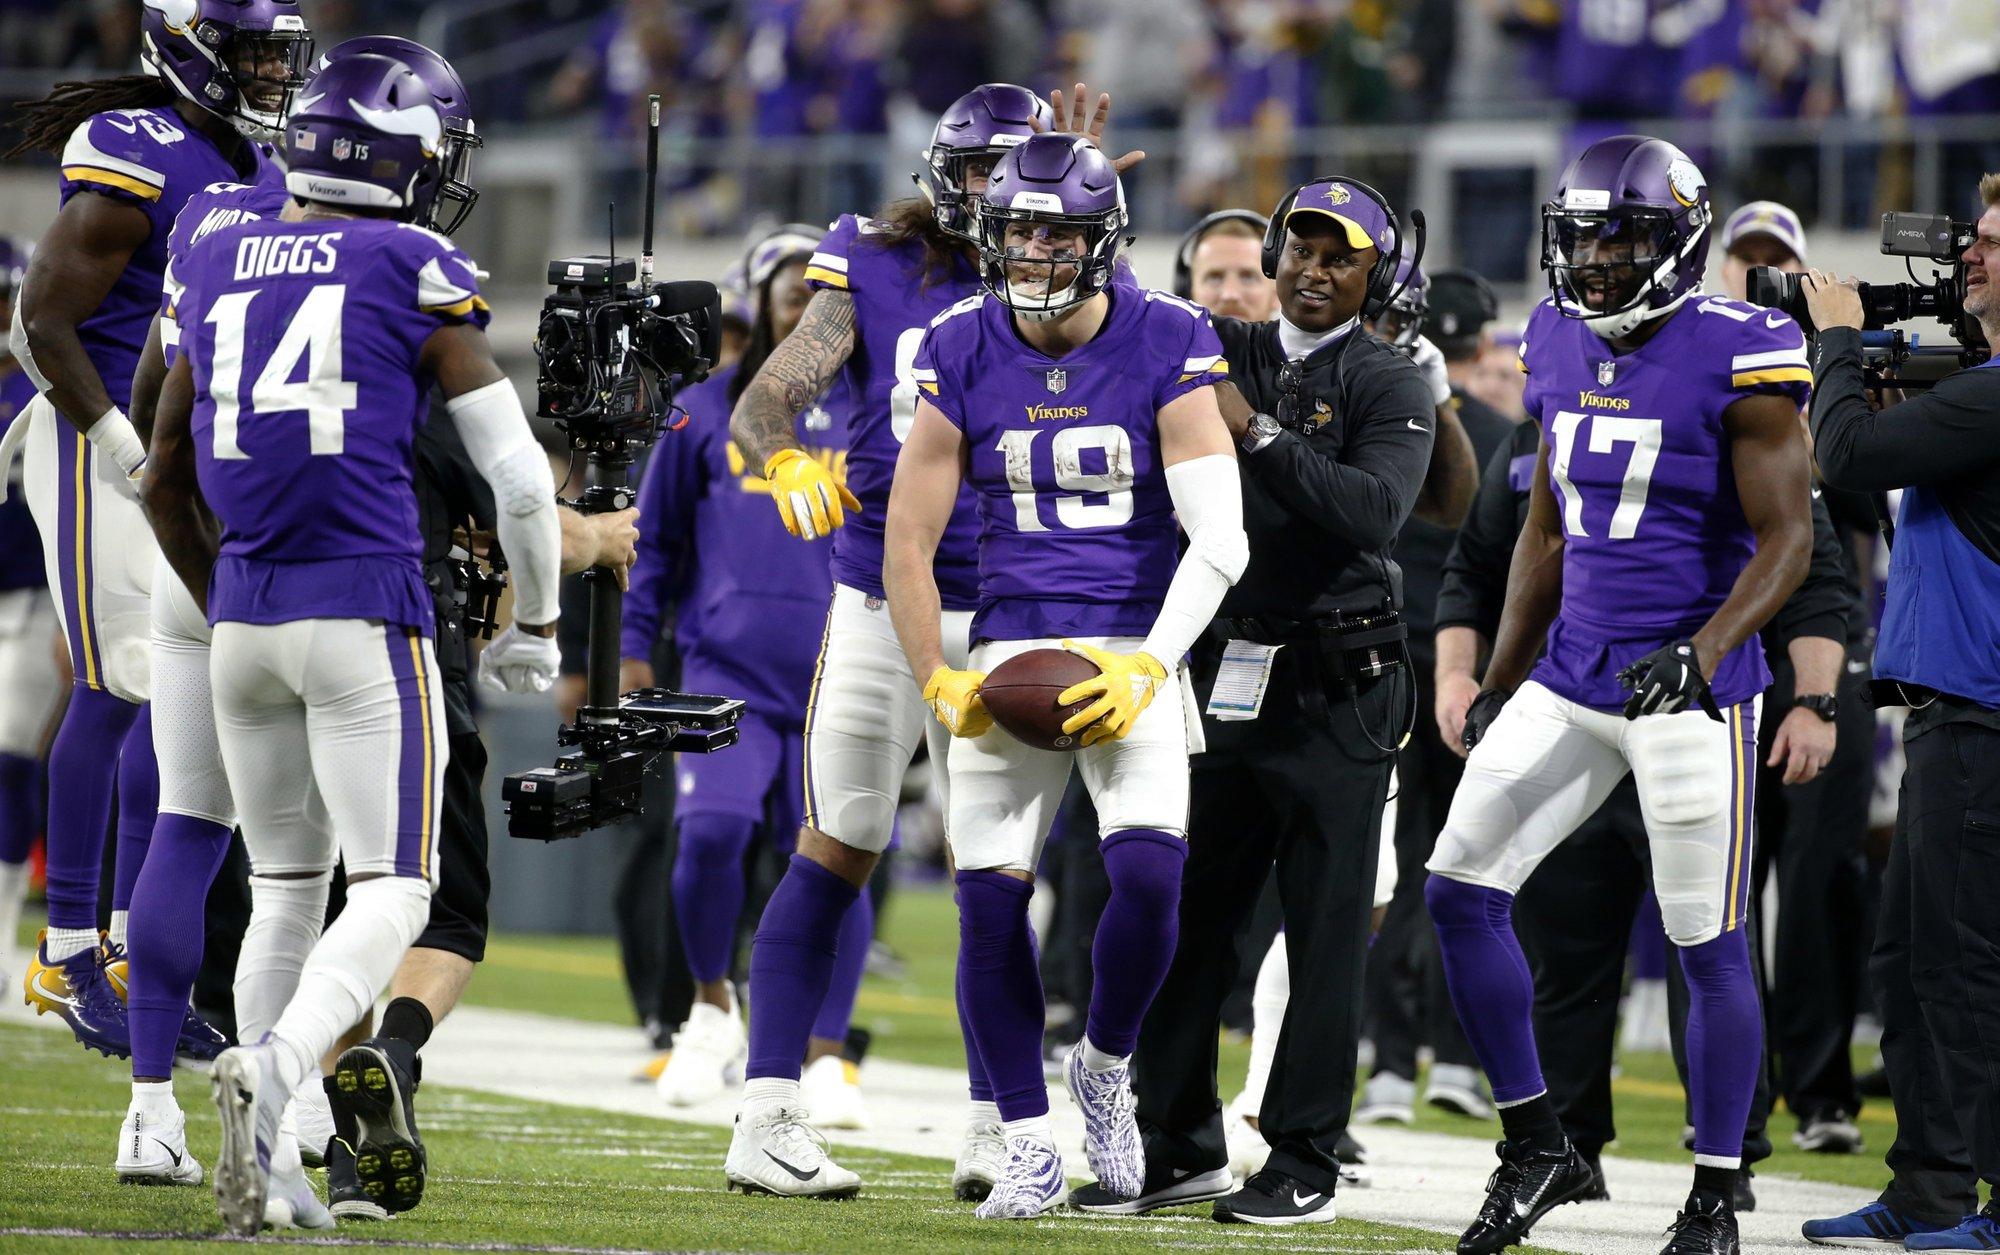 Vikings se impone 24-17 a los Green Bay Packers